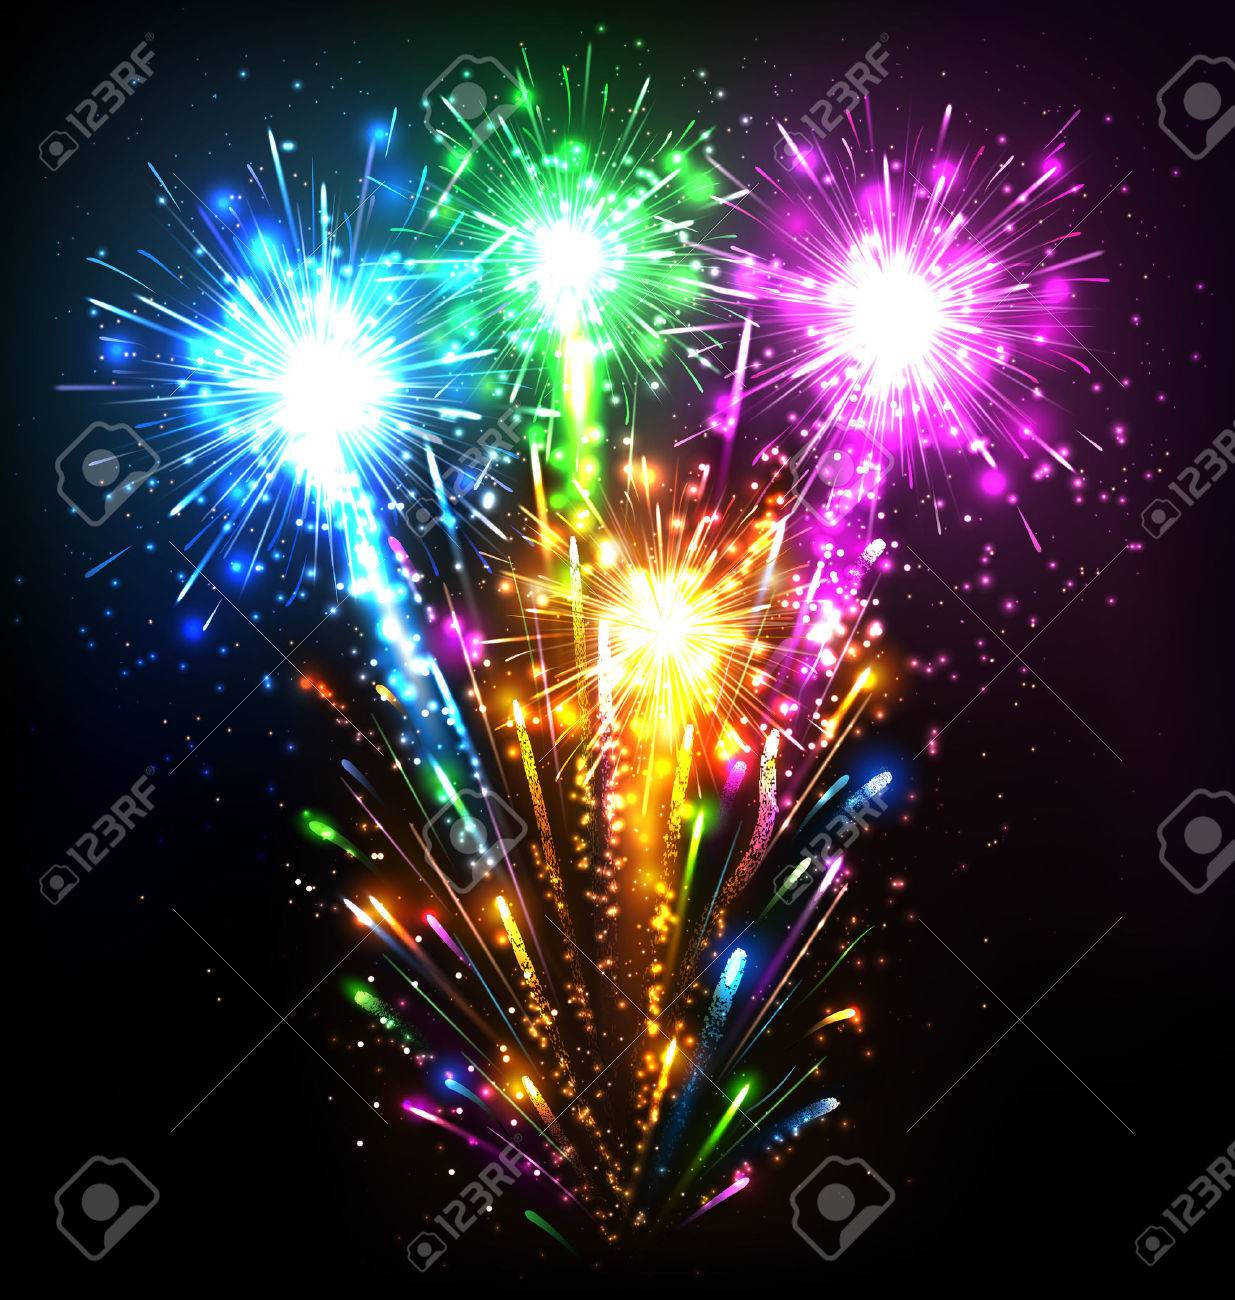 Festive Firework Salute Burst on Black Background - 47163765